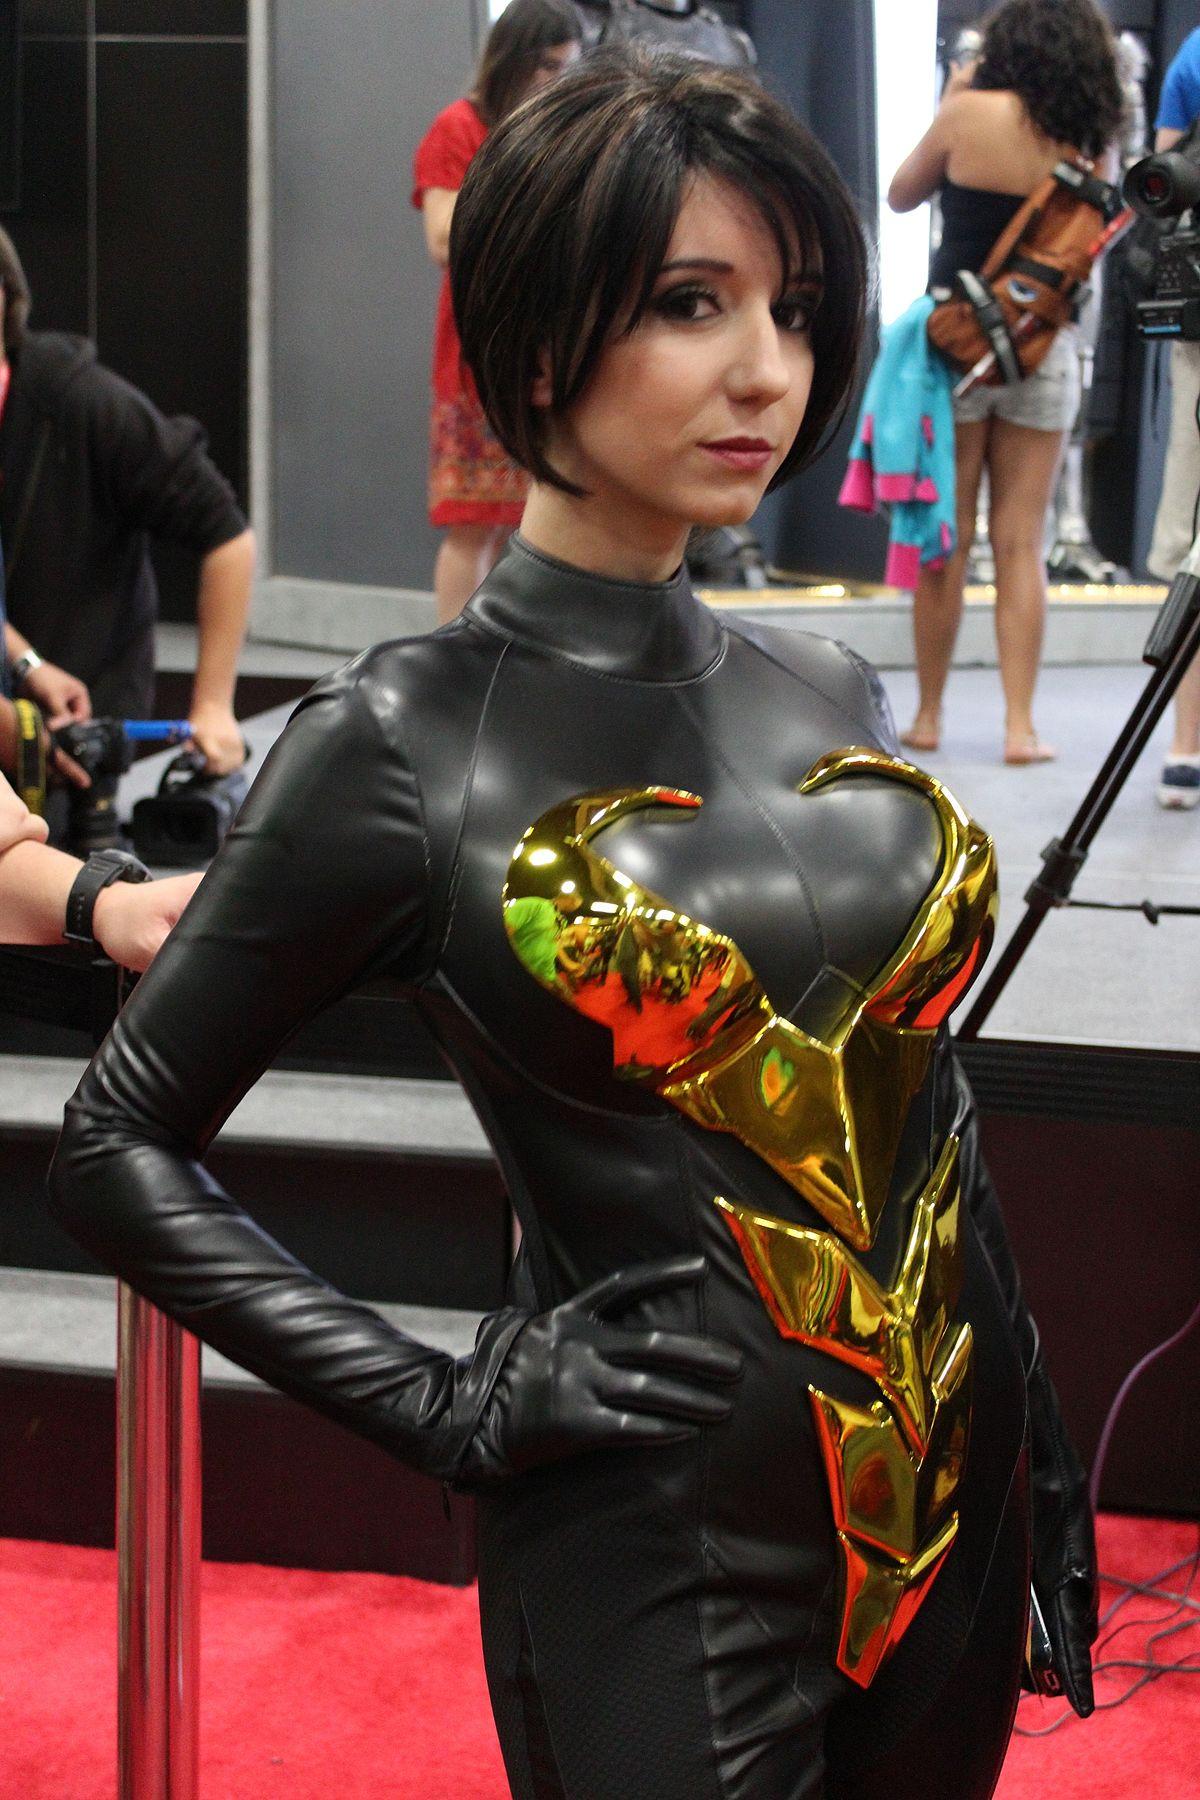 Gu pe marvel comics wikip dia - Image super heros fille ...